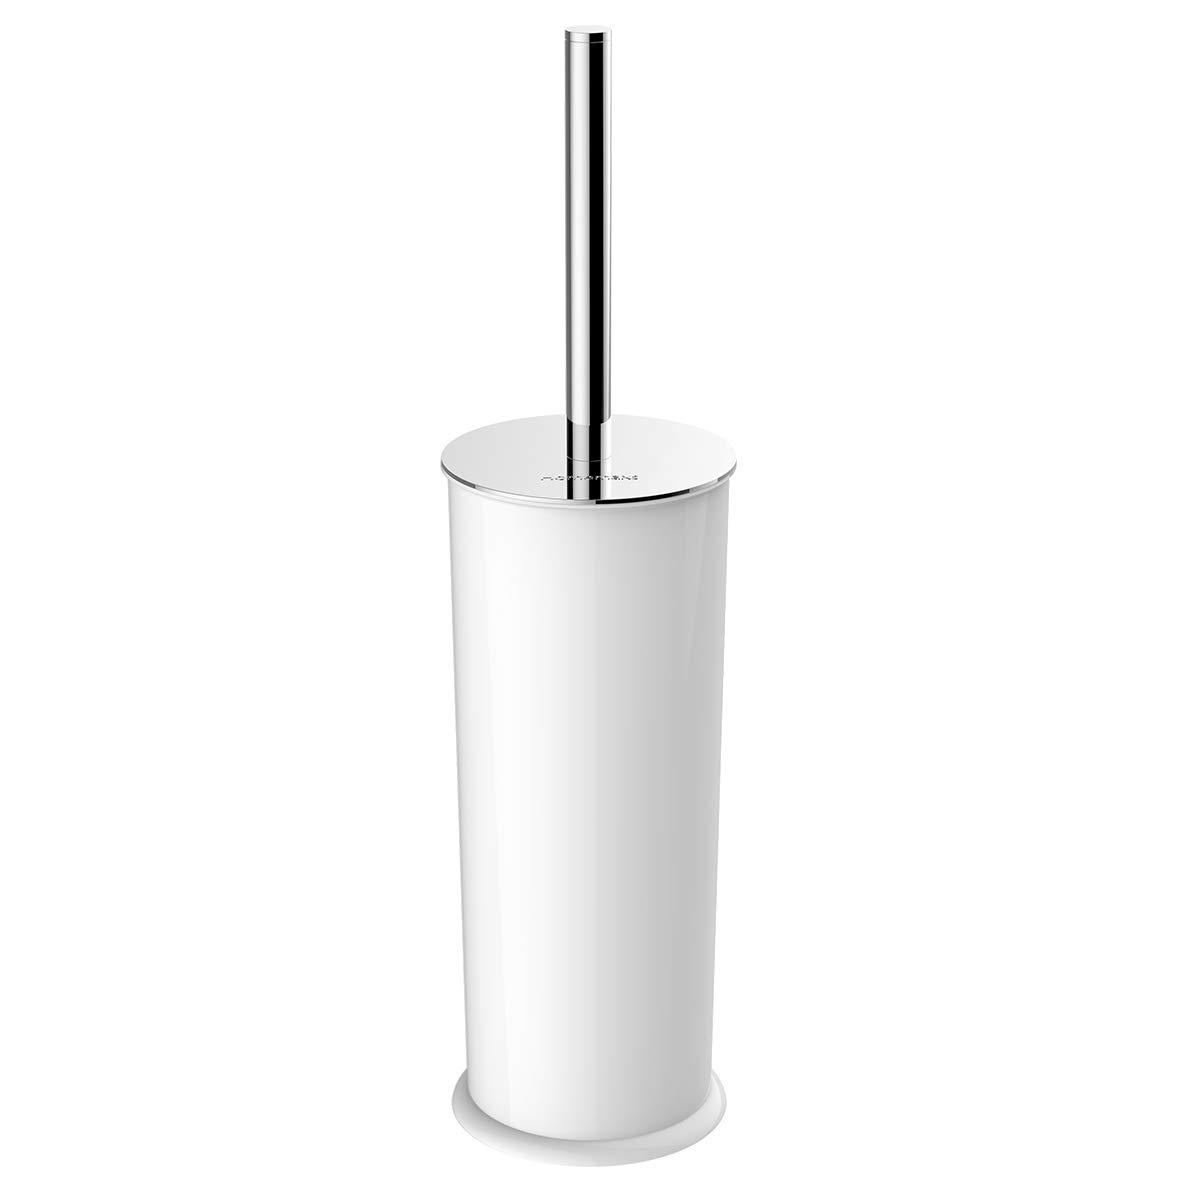 Homemaxs Toilet Brush and Holder 【2019 Upgraded】 Toilet Bowl BrushToilet Brush with 304 Stainless Steel Long Handle for Bathroom by Homemaxs